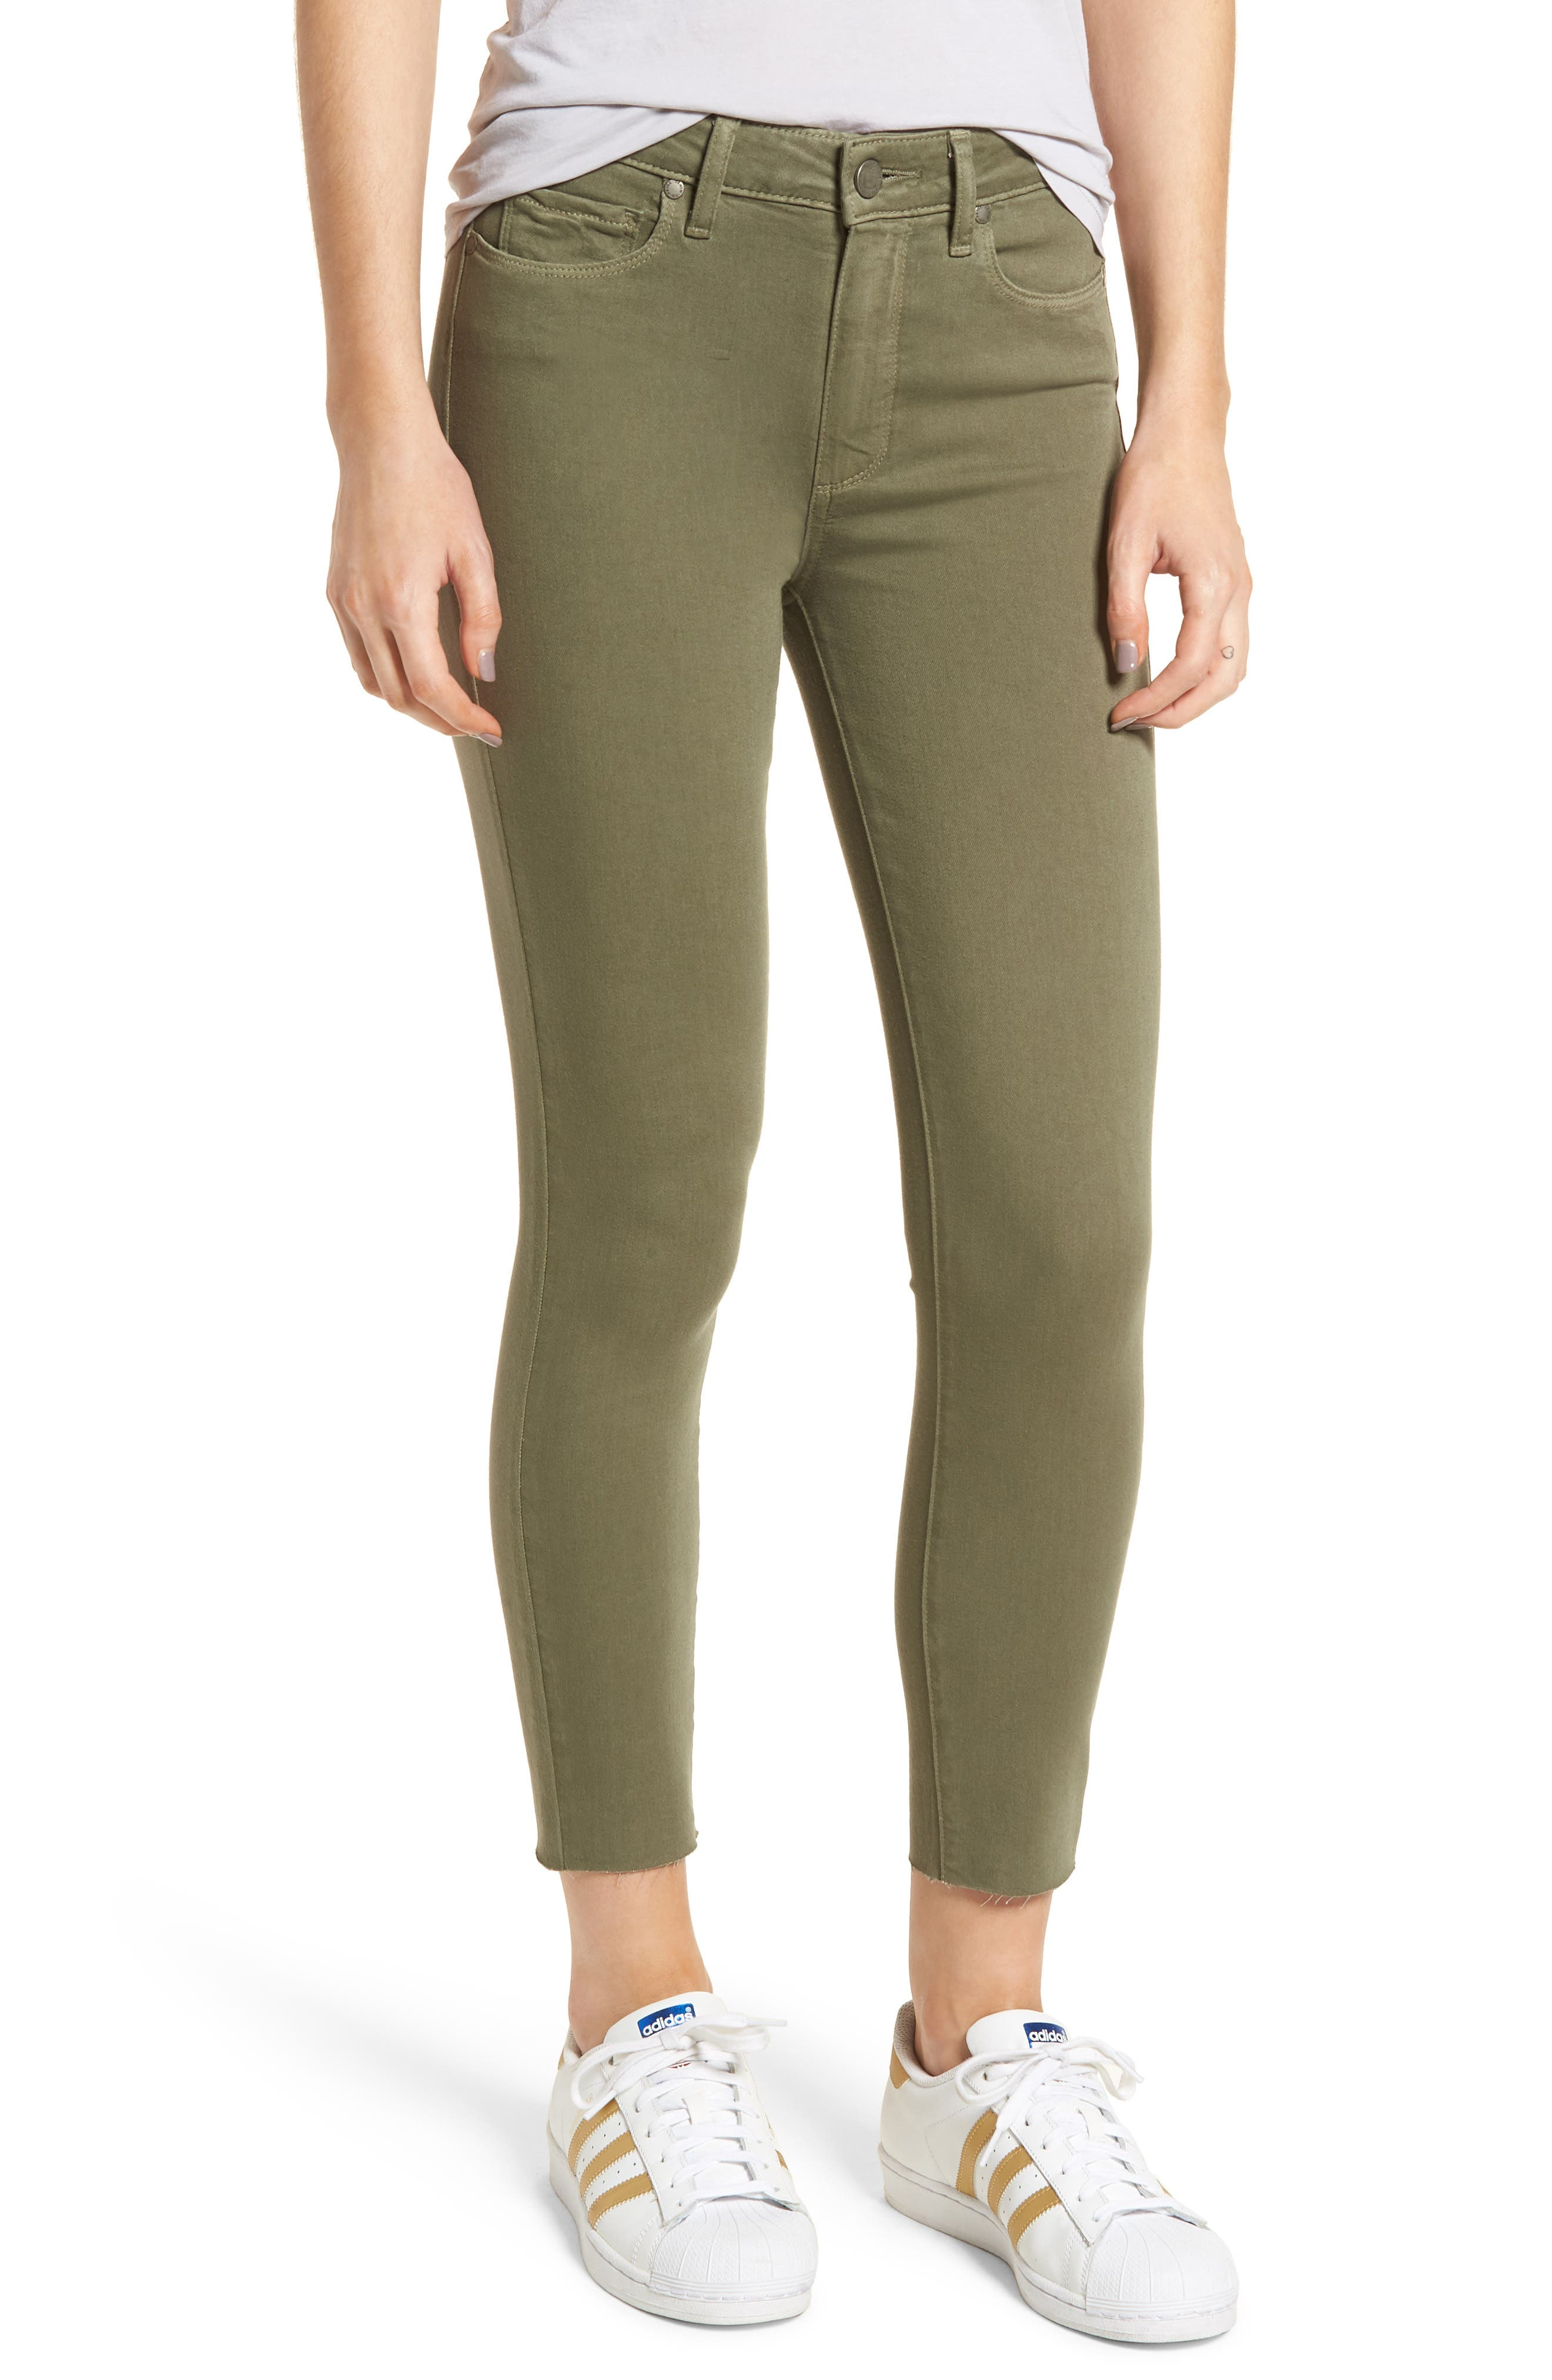 Hoxton Transcend High Waist Crop Skinny Jeans,                         Main,                         color,